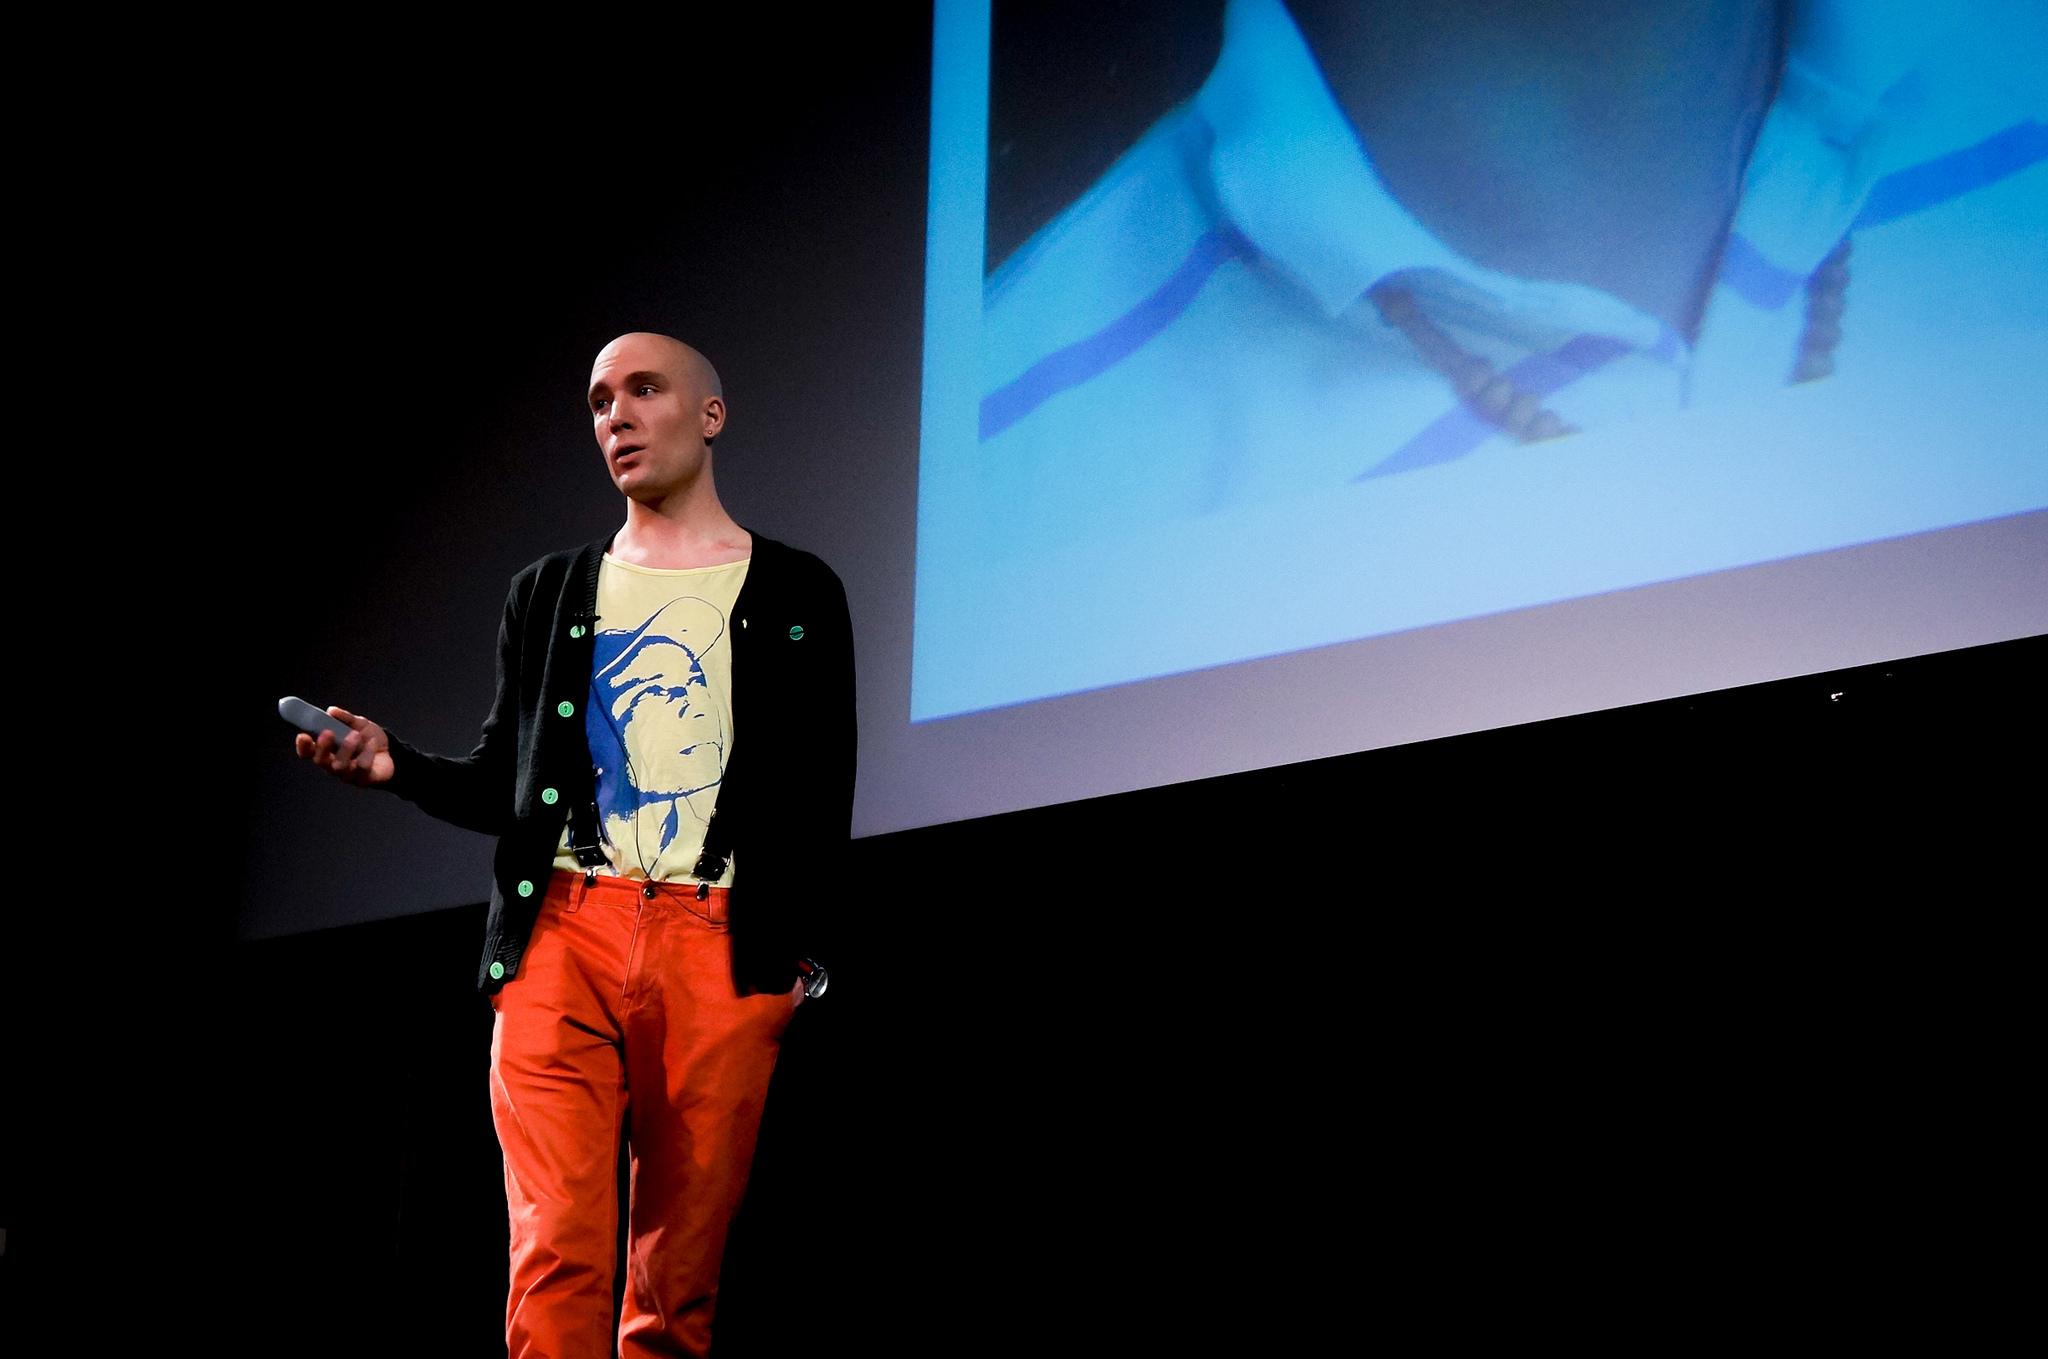 Patrik Appelquist TEDx